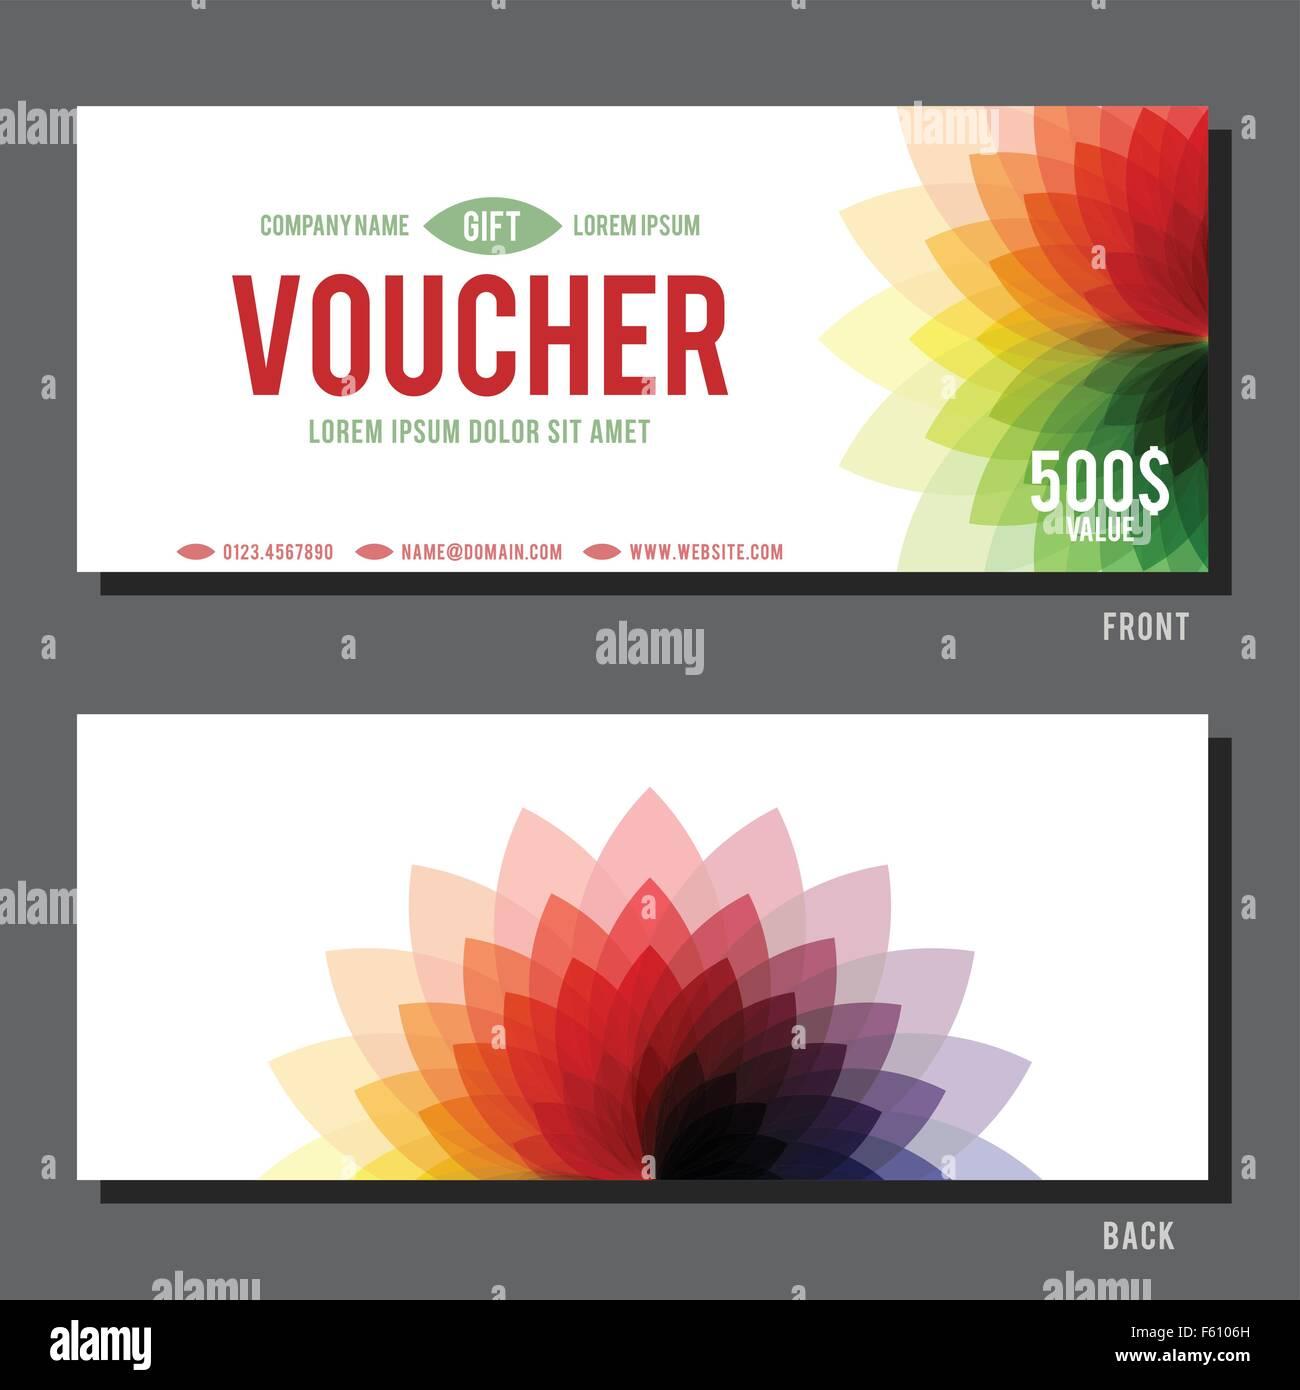 Gift Voucher Template Abstract Floral Stockfotos & Gift Voucher ...